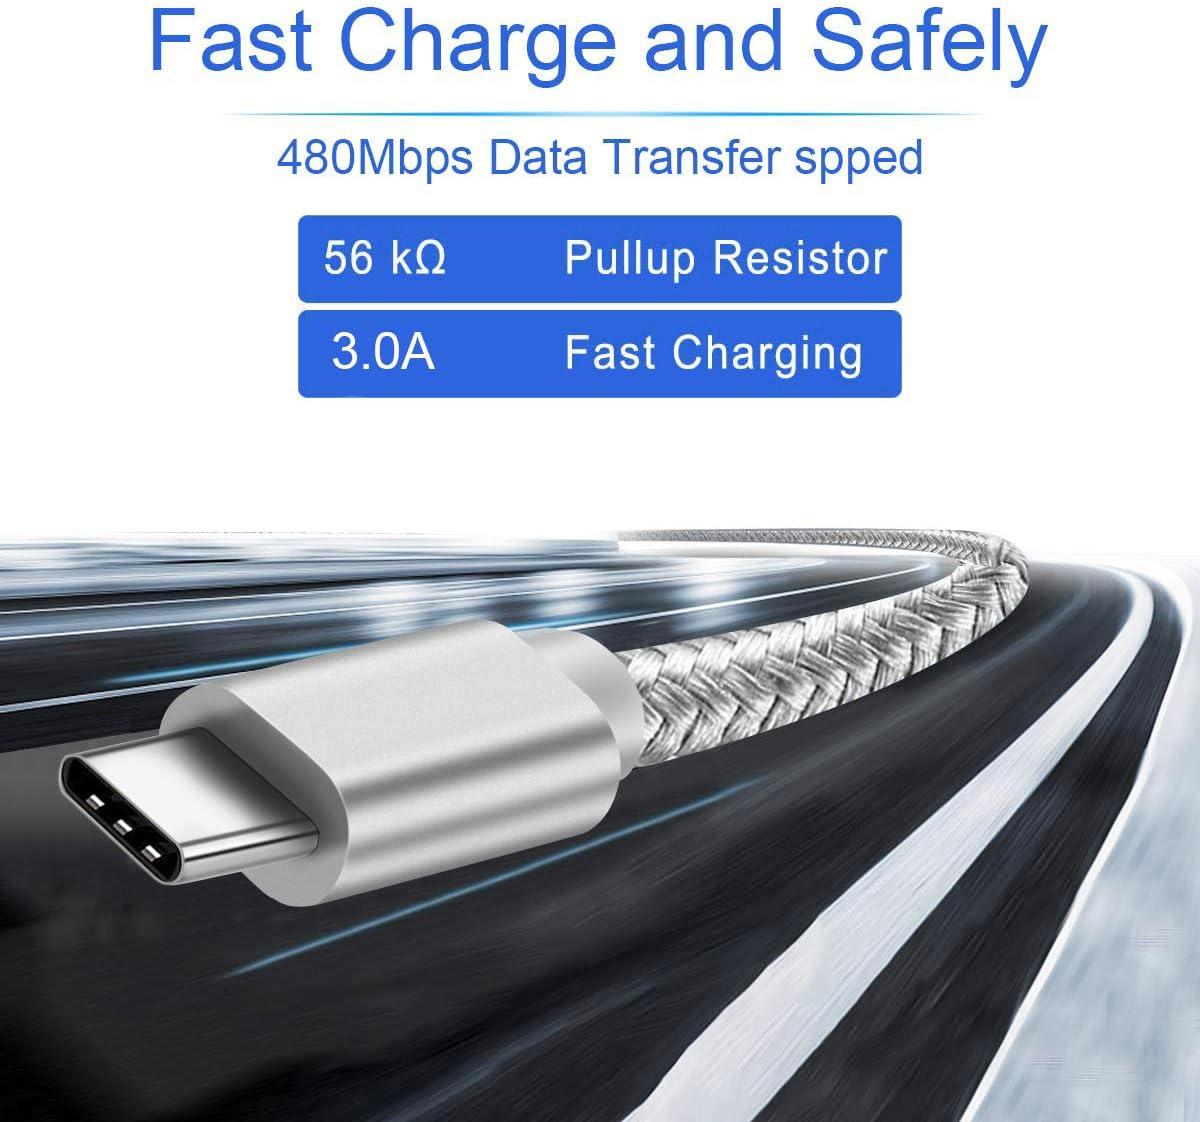 Cable Cargador USB Tipo C,Charger Cord for LG V40 V50 V35 G8 G7 G8X G9 Thinq,Stylo 5/Plus,Samsung Galaxy A10E A51 A71 S11,BlackBerry KEY2 LE/KEYone ...